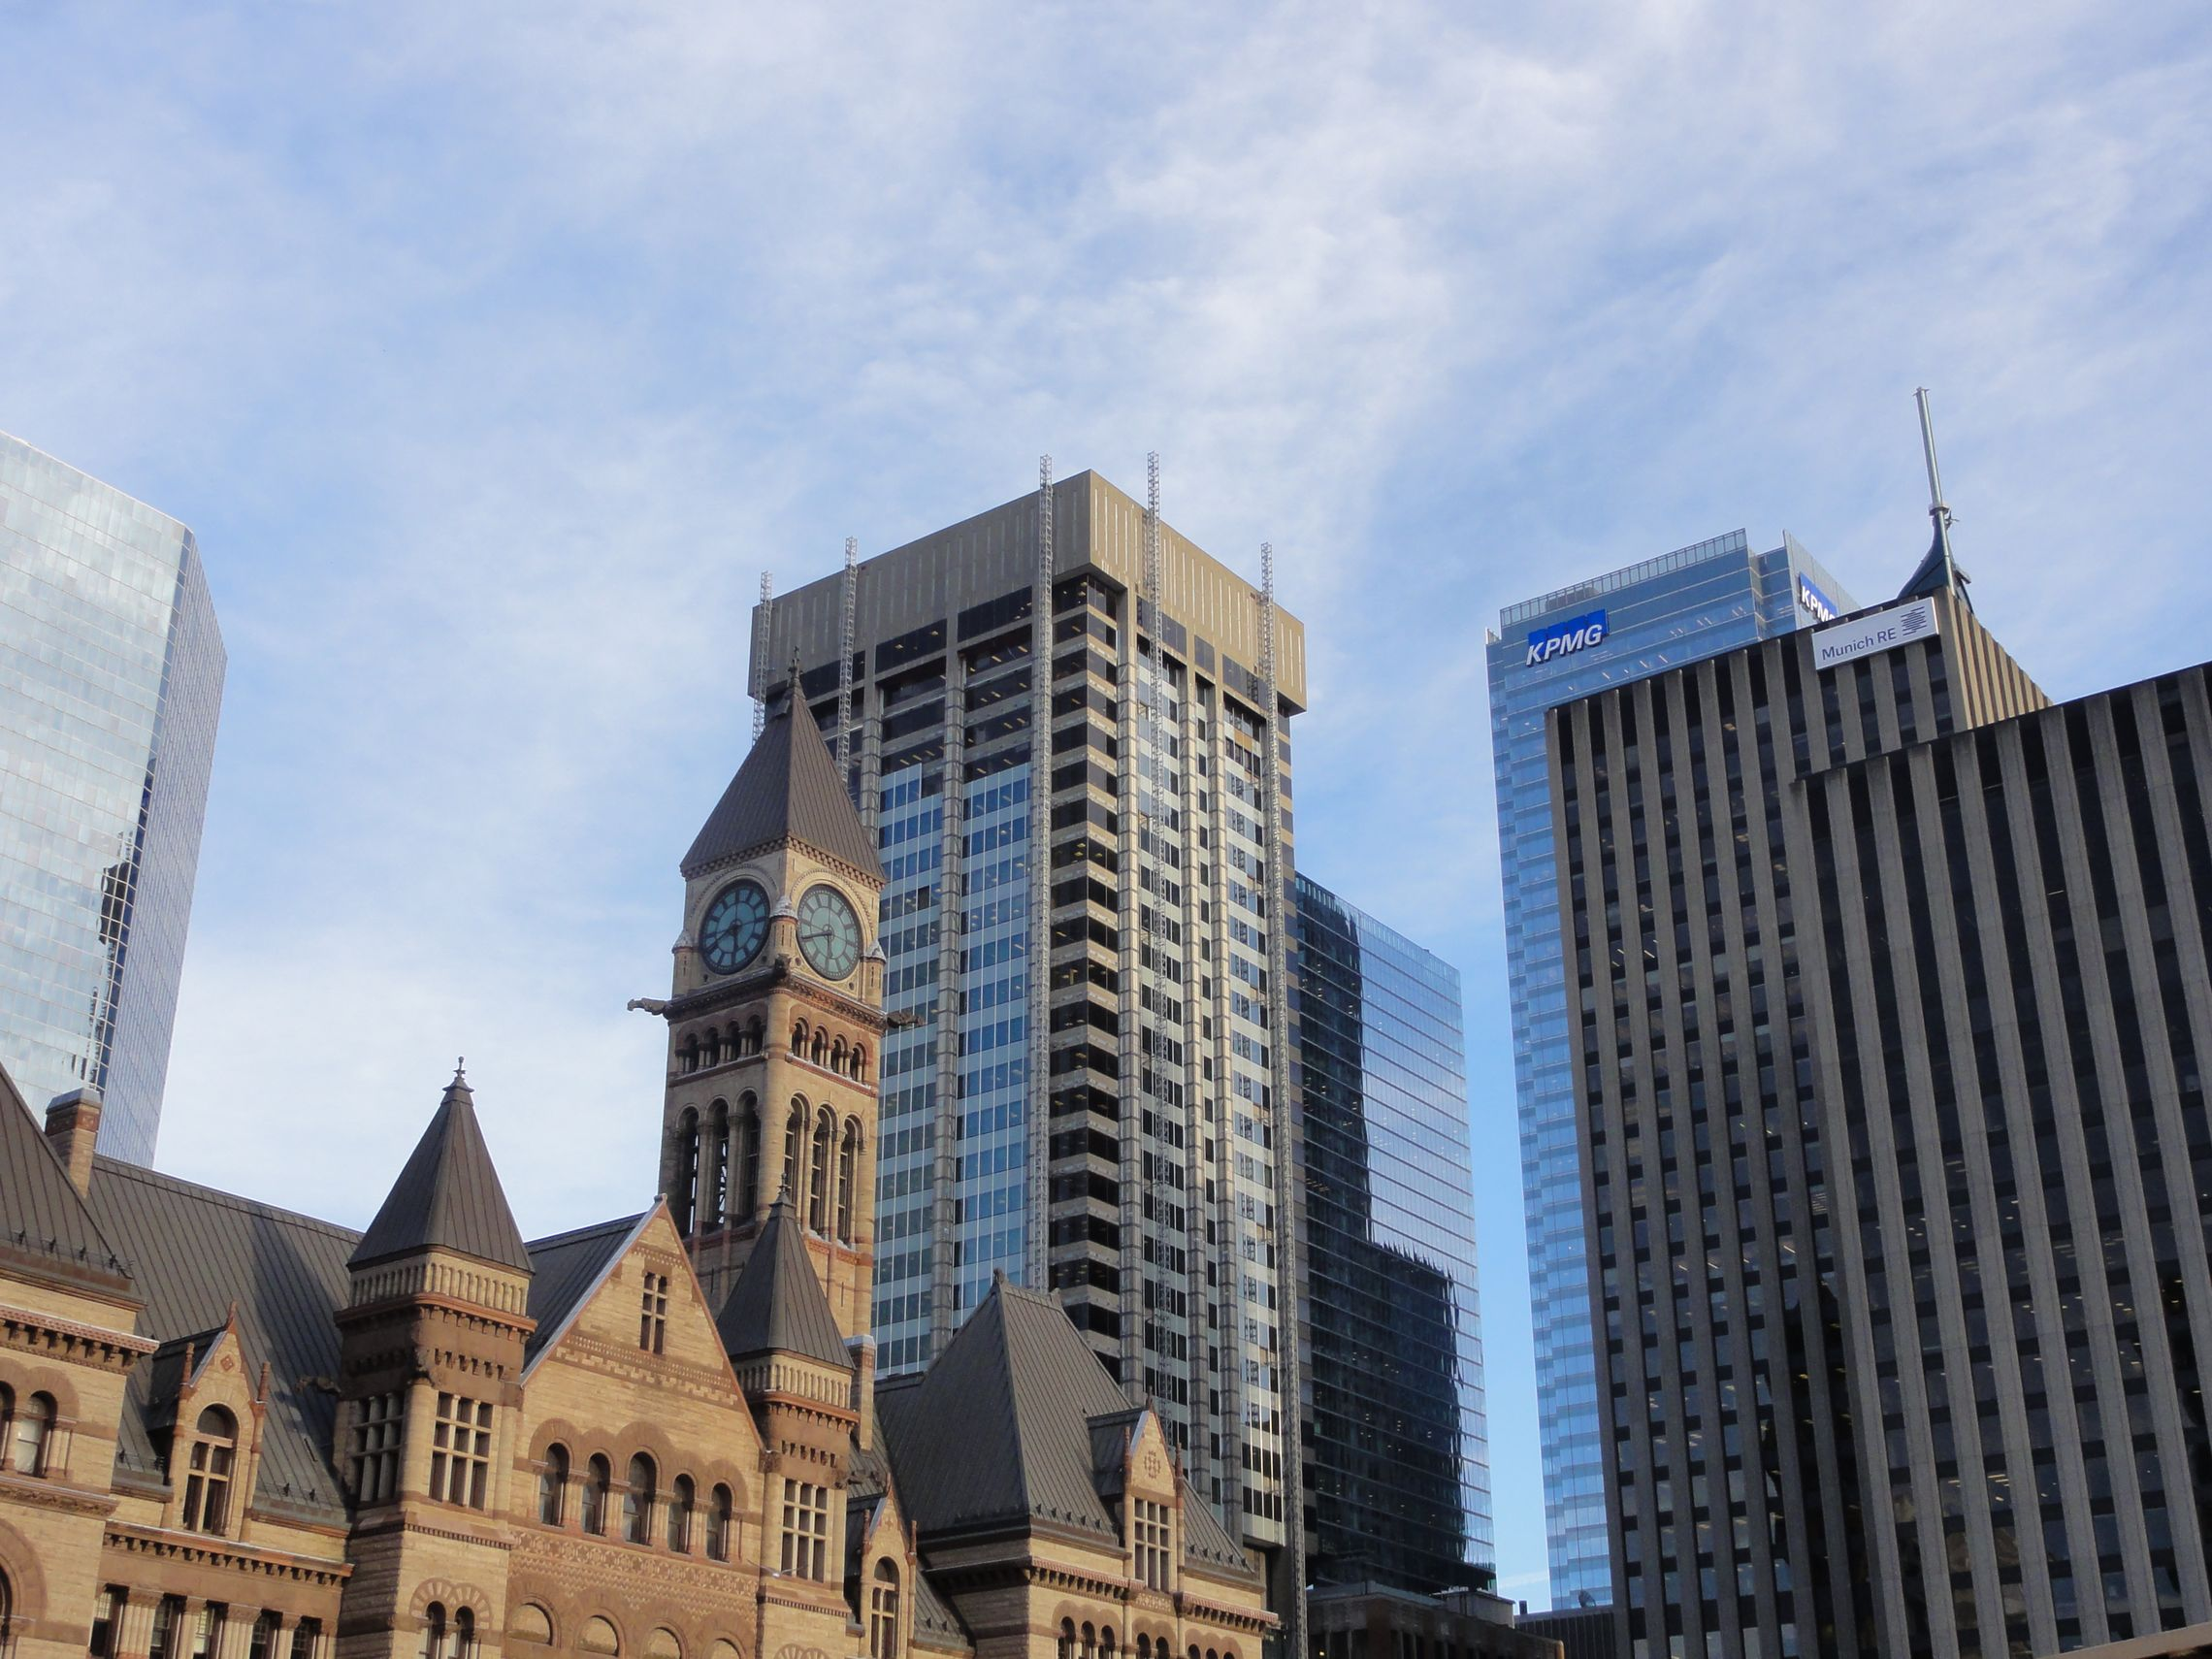 20171002 Toronto 14